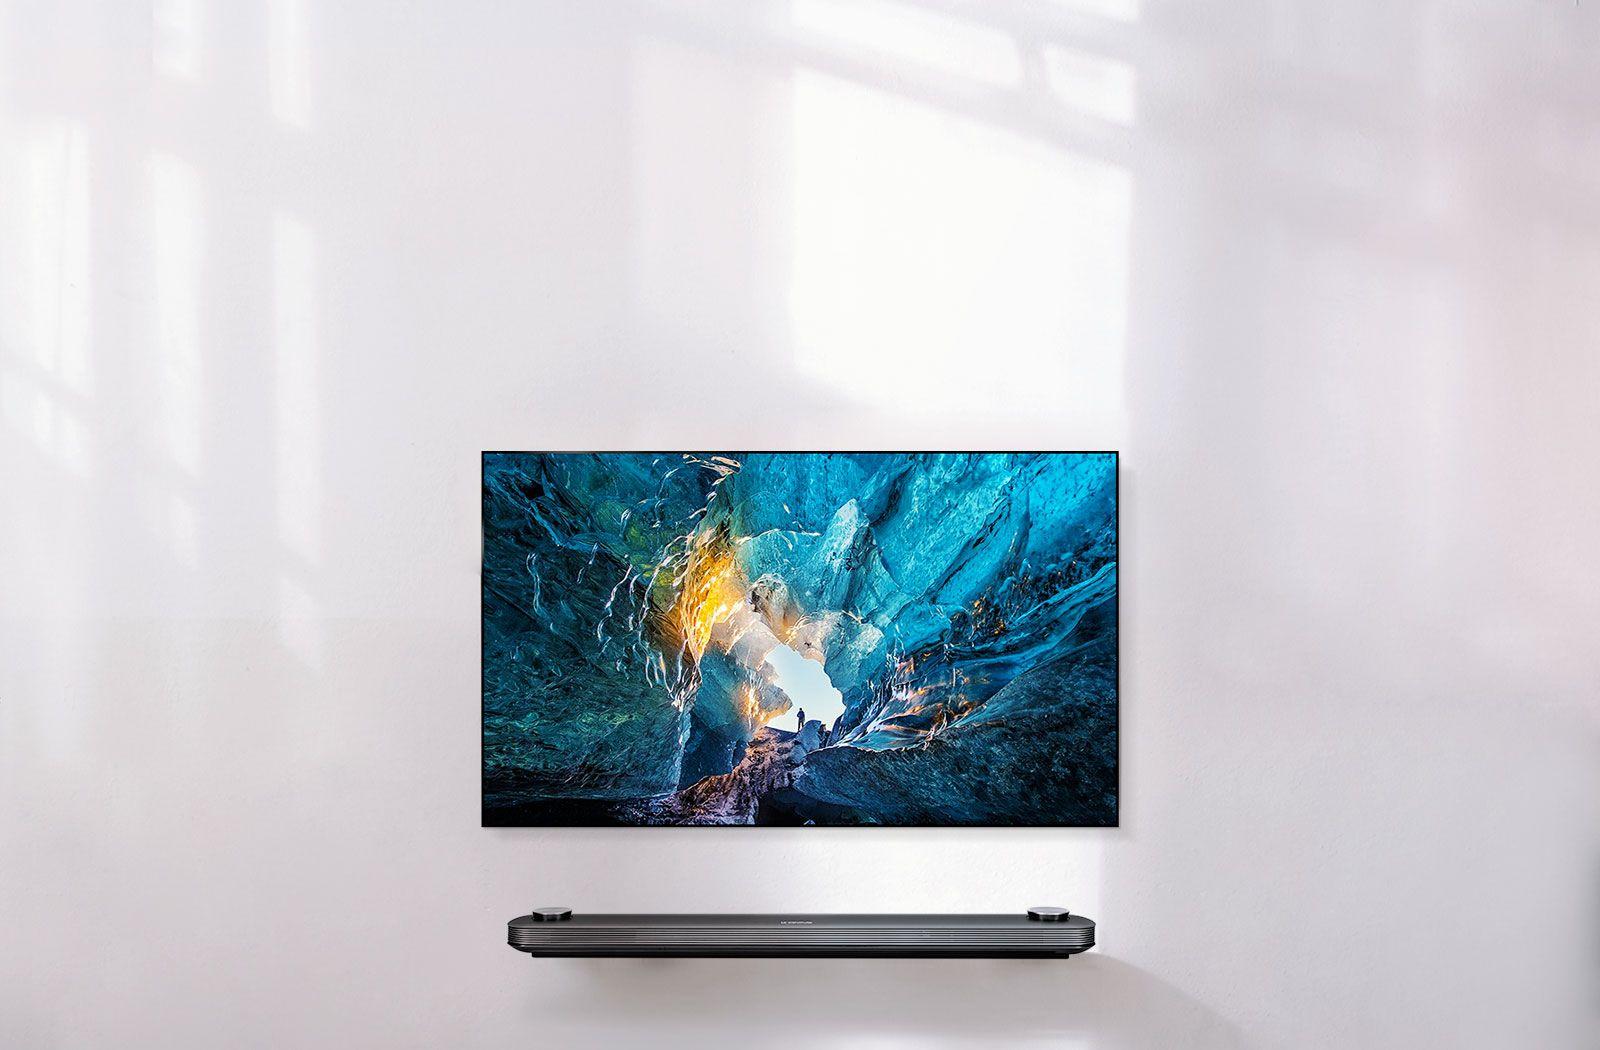 LG SIGNATURE OLED TV W 4K HDR Smart TV 65'' Class (64